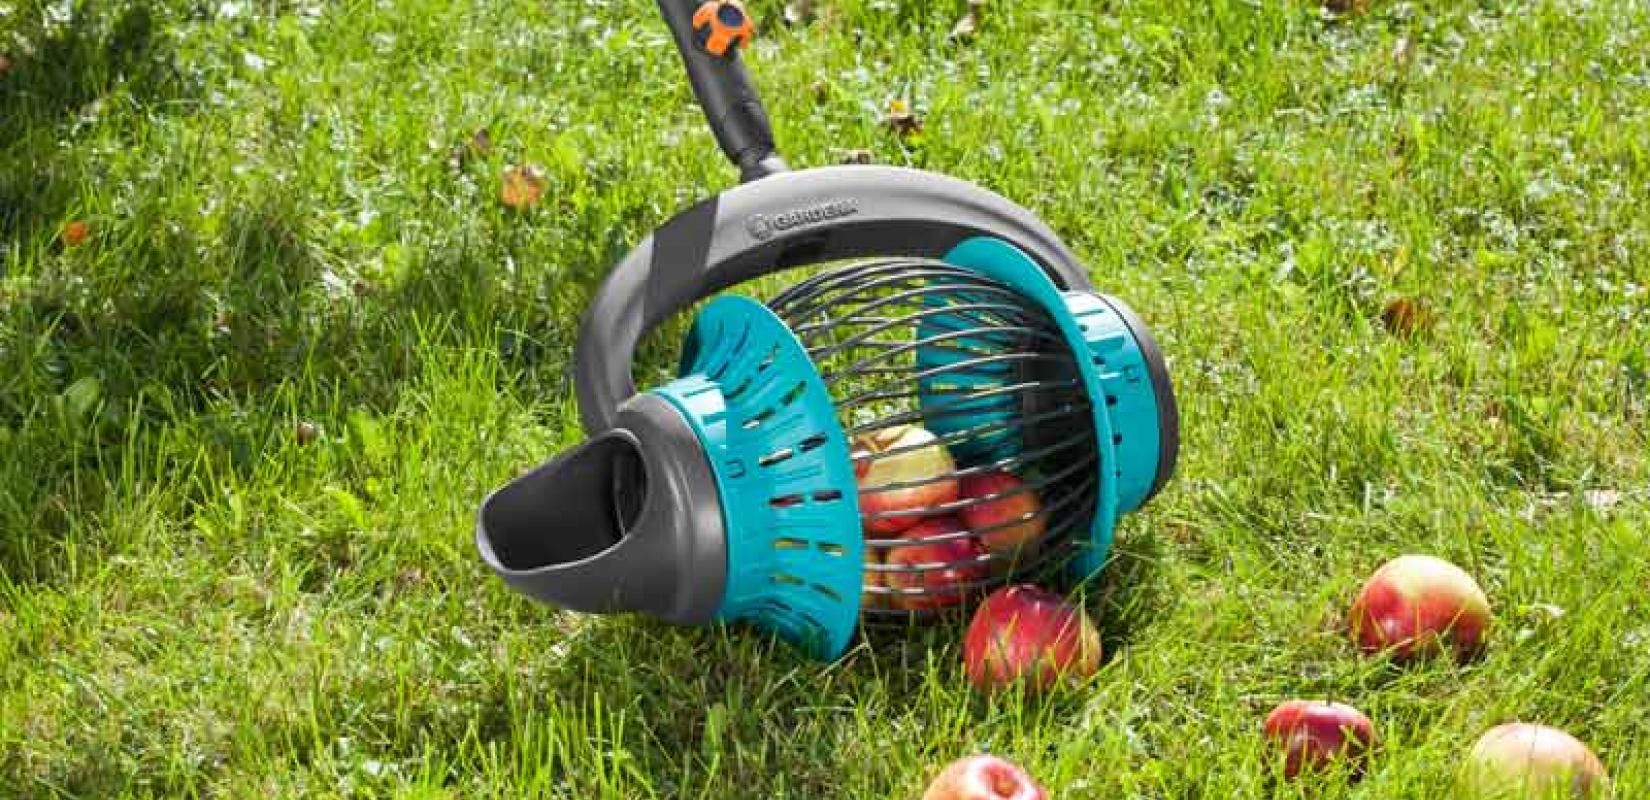 gardena enrichit sa gamme d outils jardin avec un ramasse. Black Bedroom Furniture Sets. Home Design Ideas